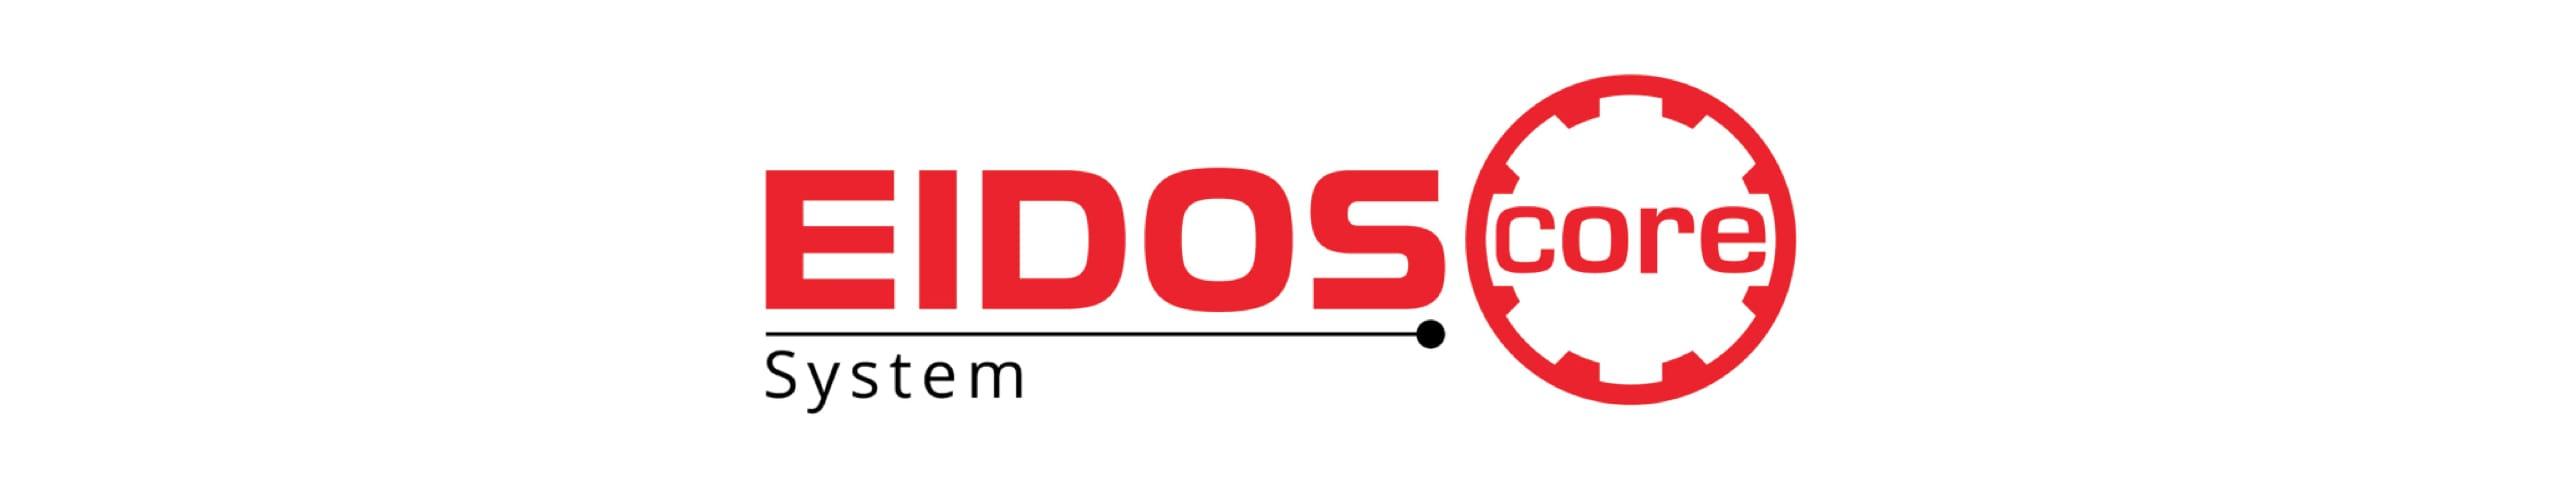 "EIDOS introduce ""EIDOS CORE System"""